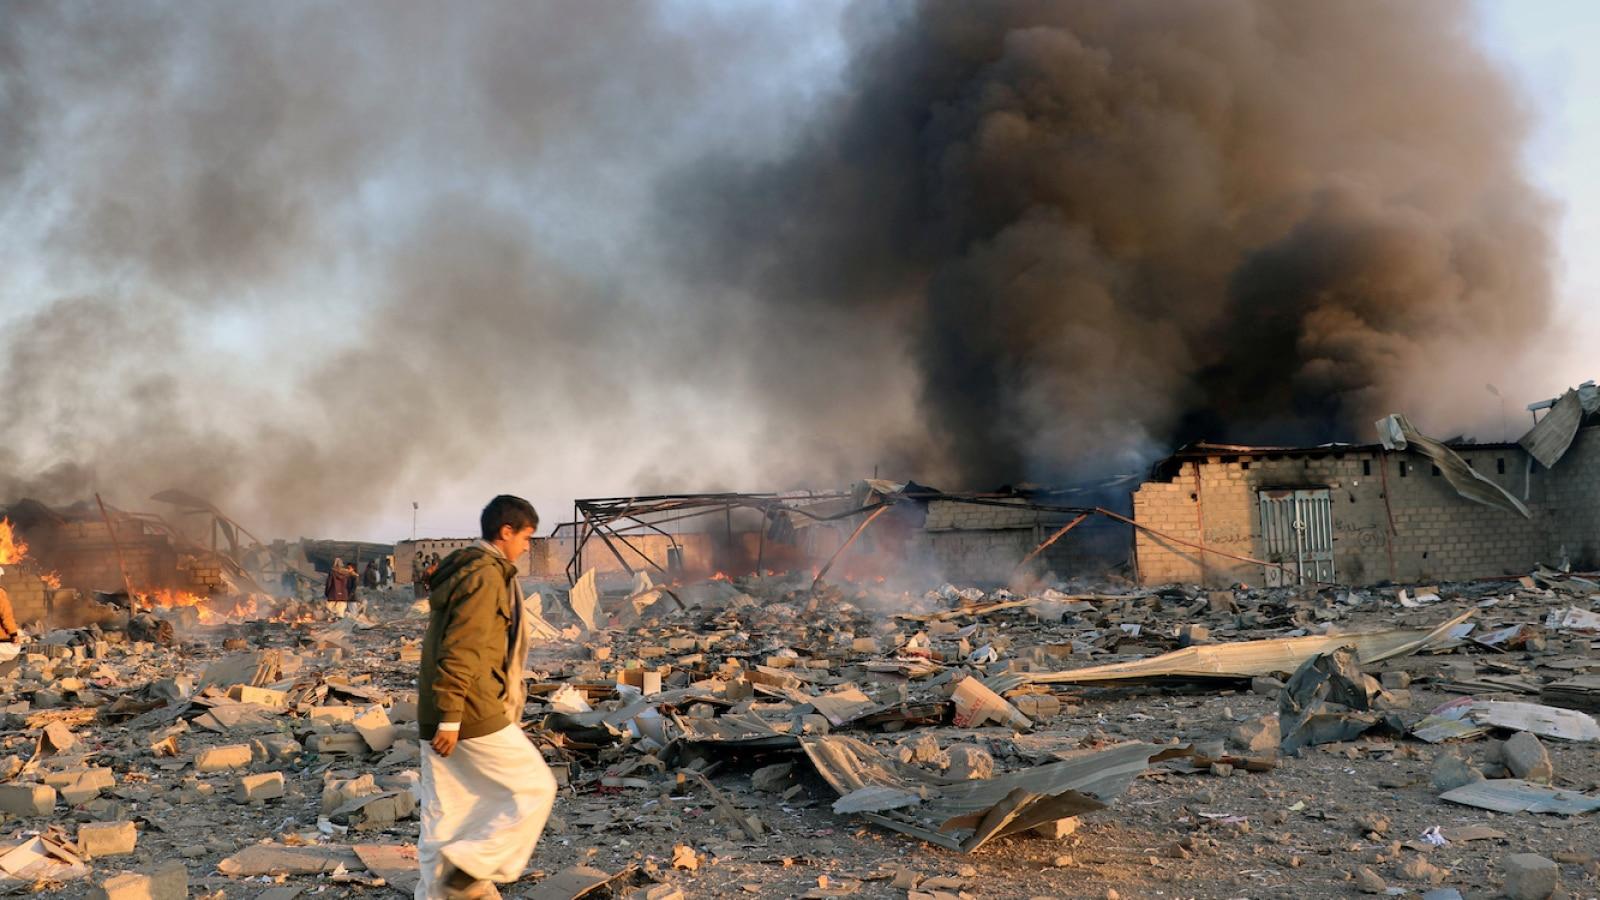 INGOs in Yemen condemn horrific attacks in Sa'ada